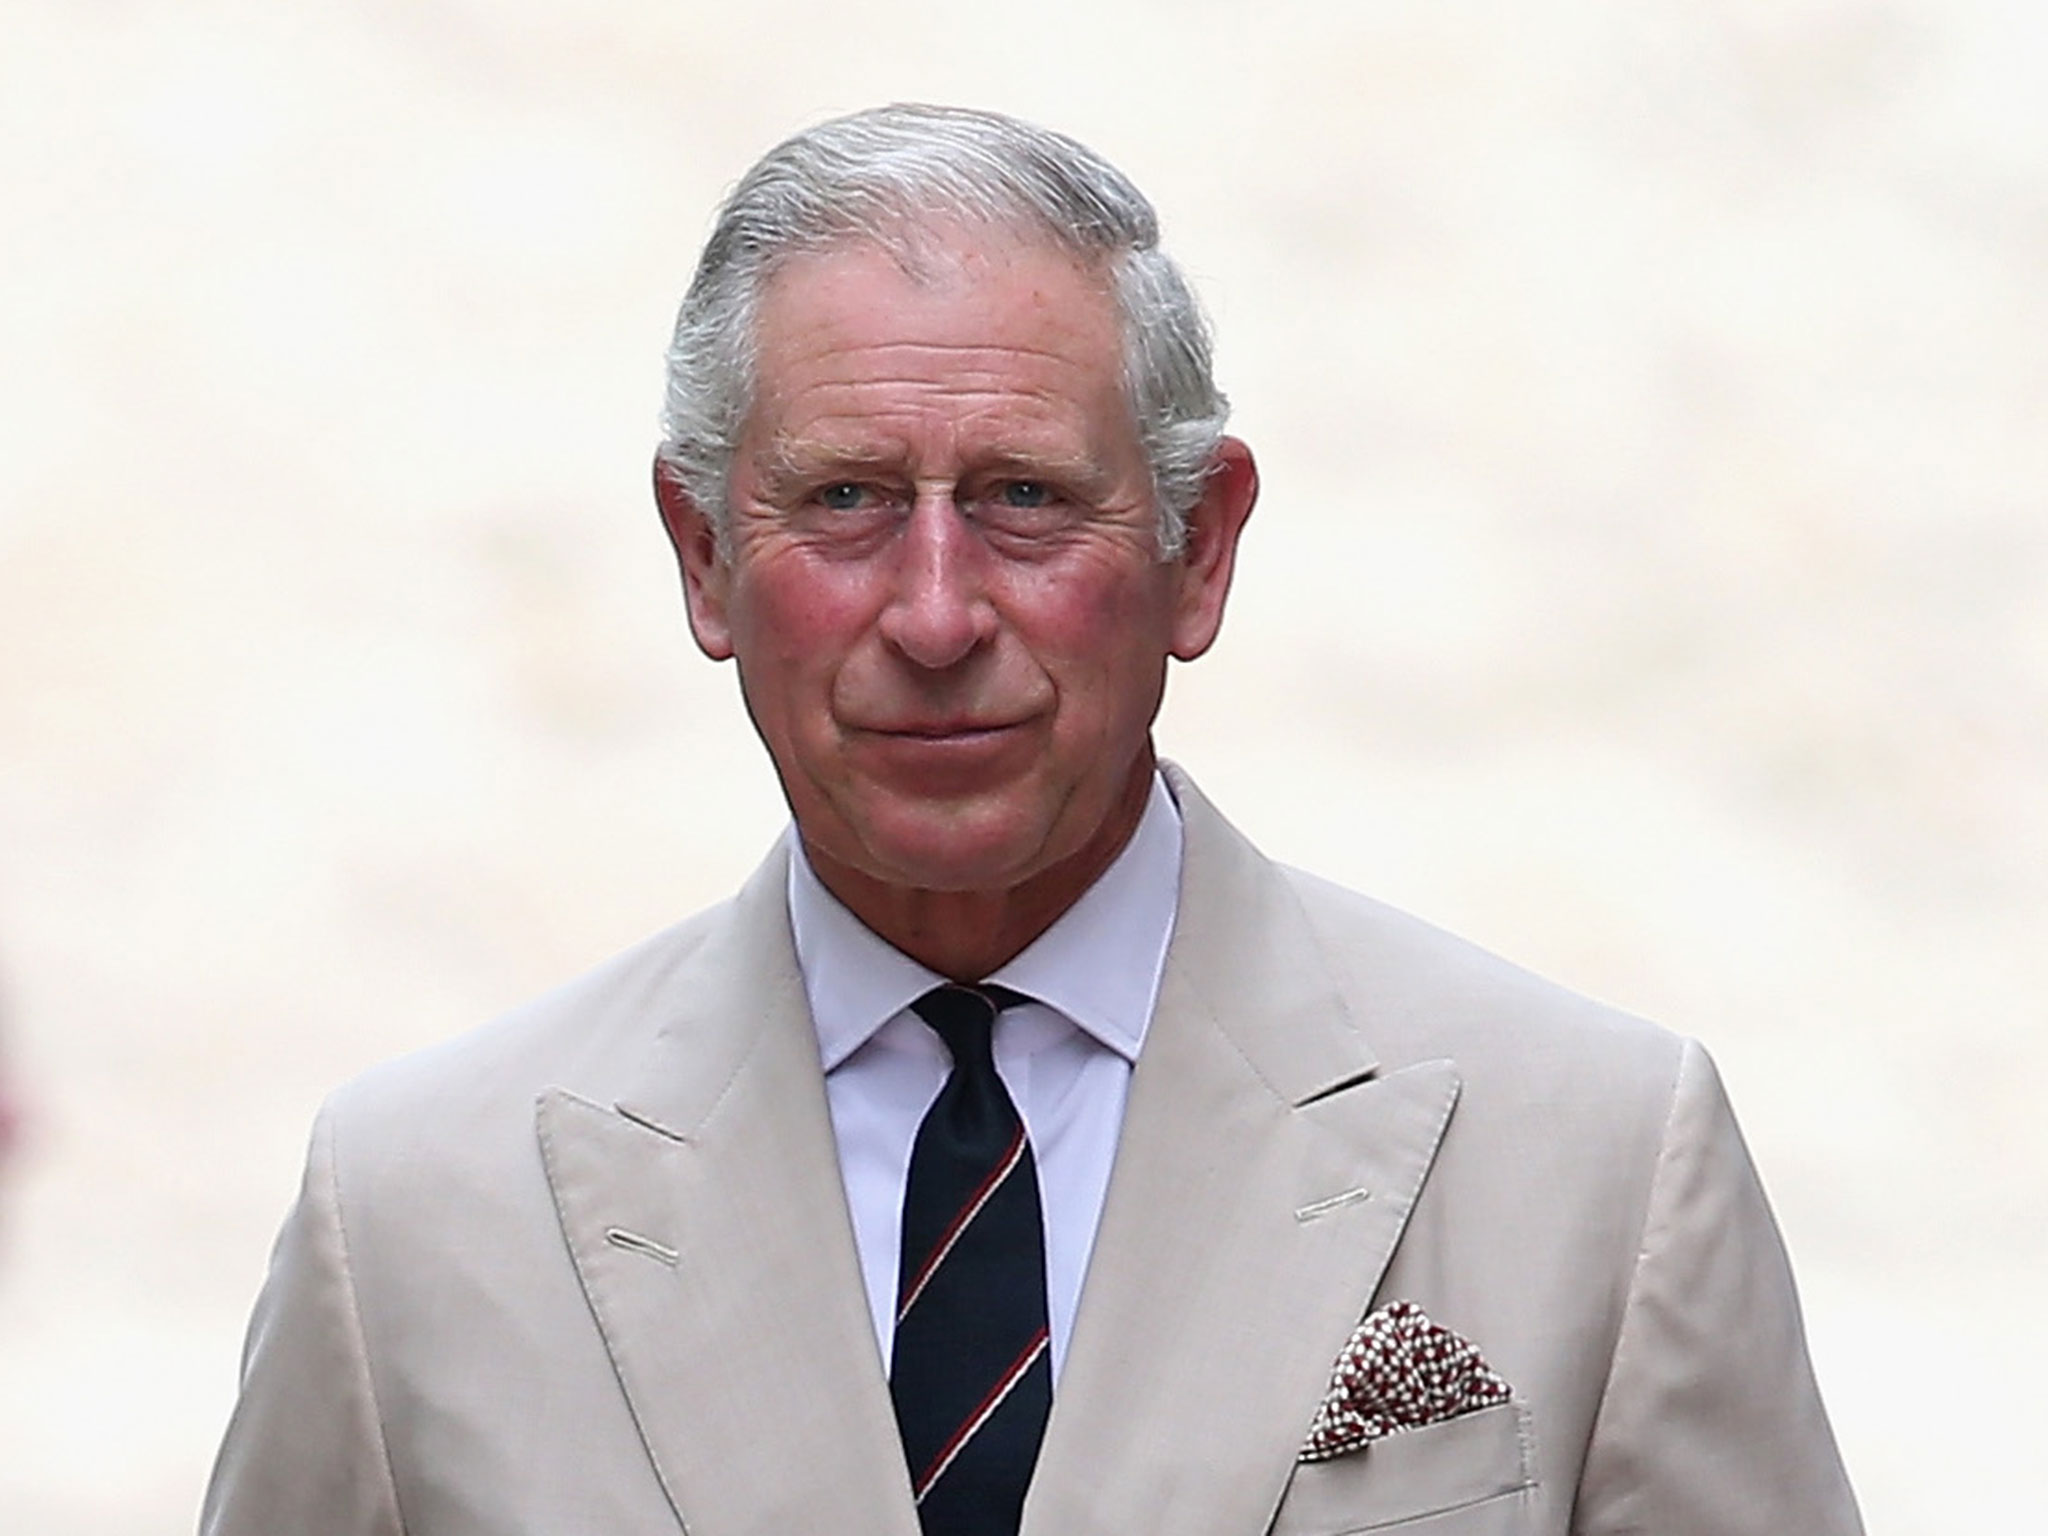 Prince of Wales Prince Charles - age: 70